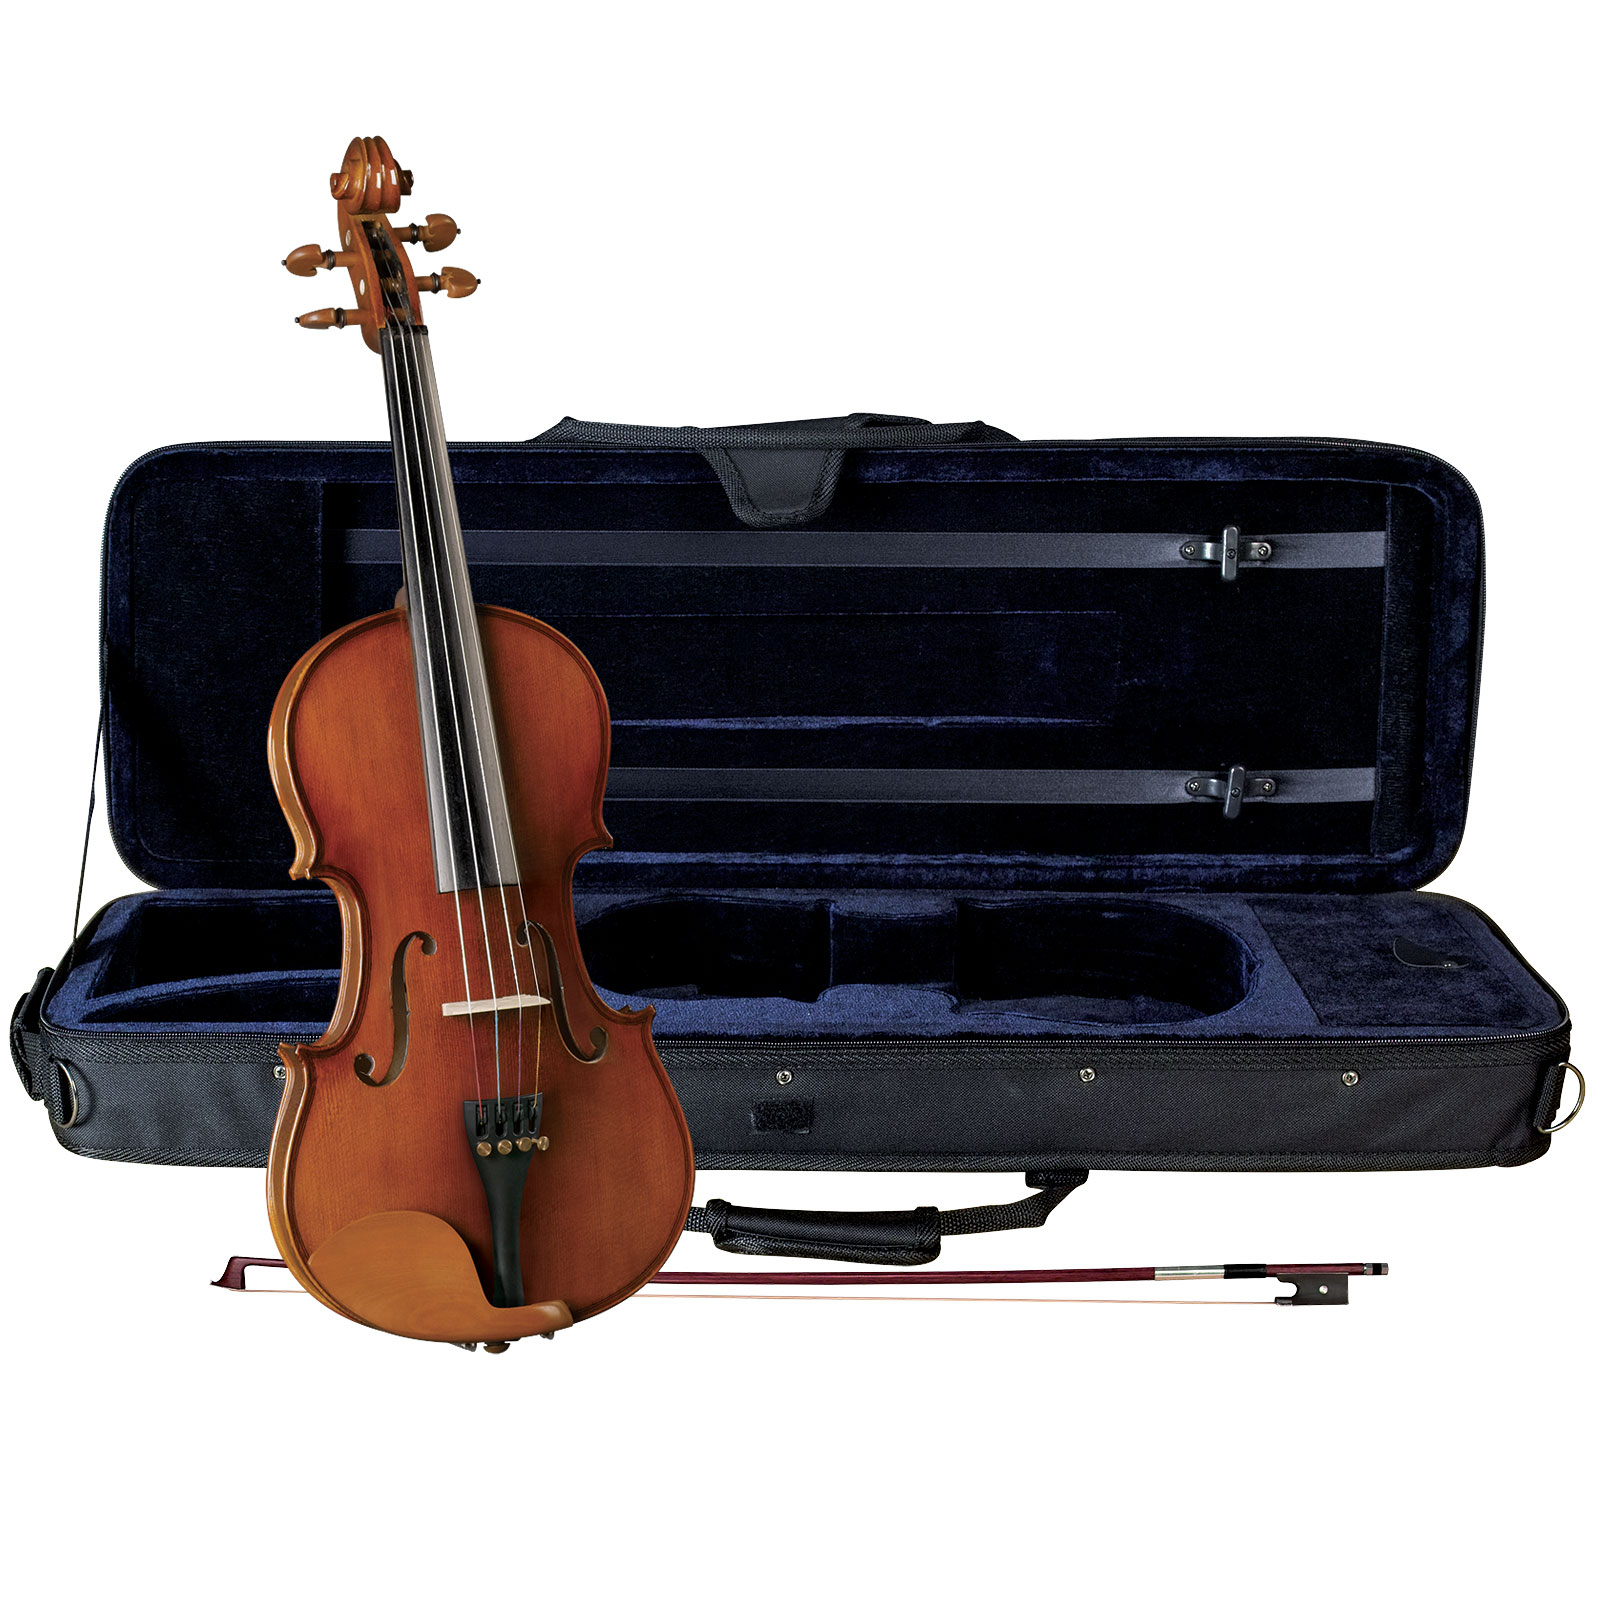 Cervini HV-500 Educator Violin Outfit 4 4 Size by Cervini